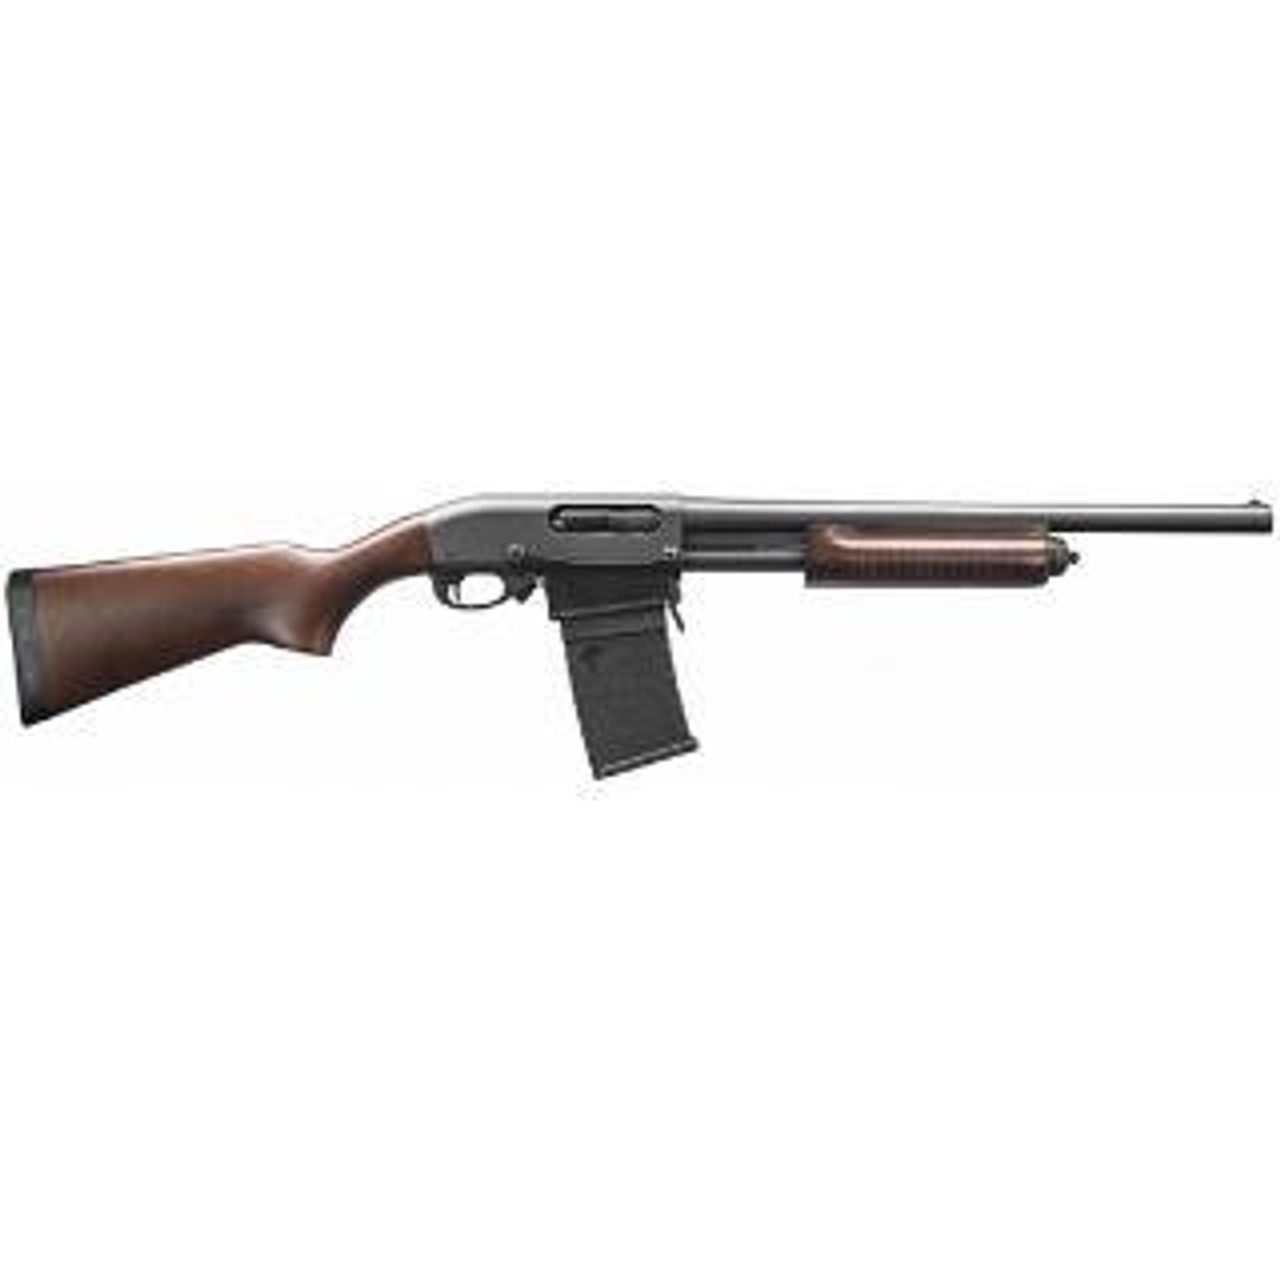 Remington 870 DM  Hard Wood CALIFORNIA LEGAL - 12GA